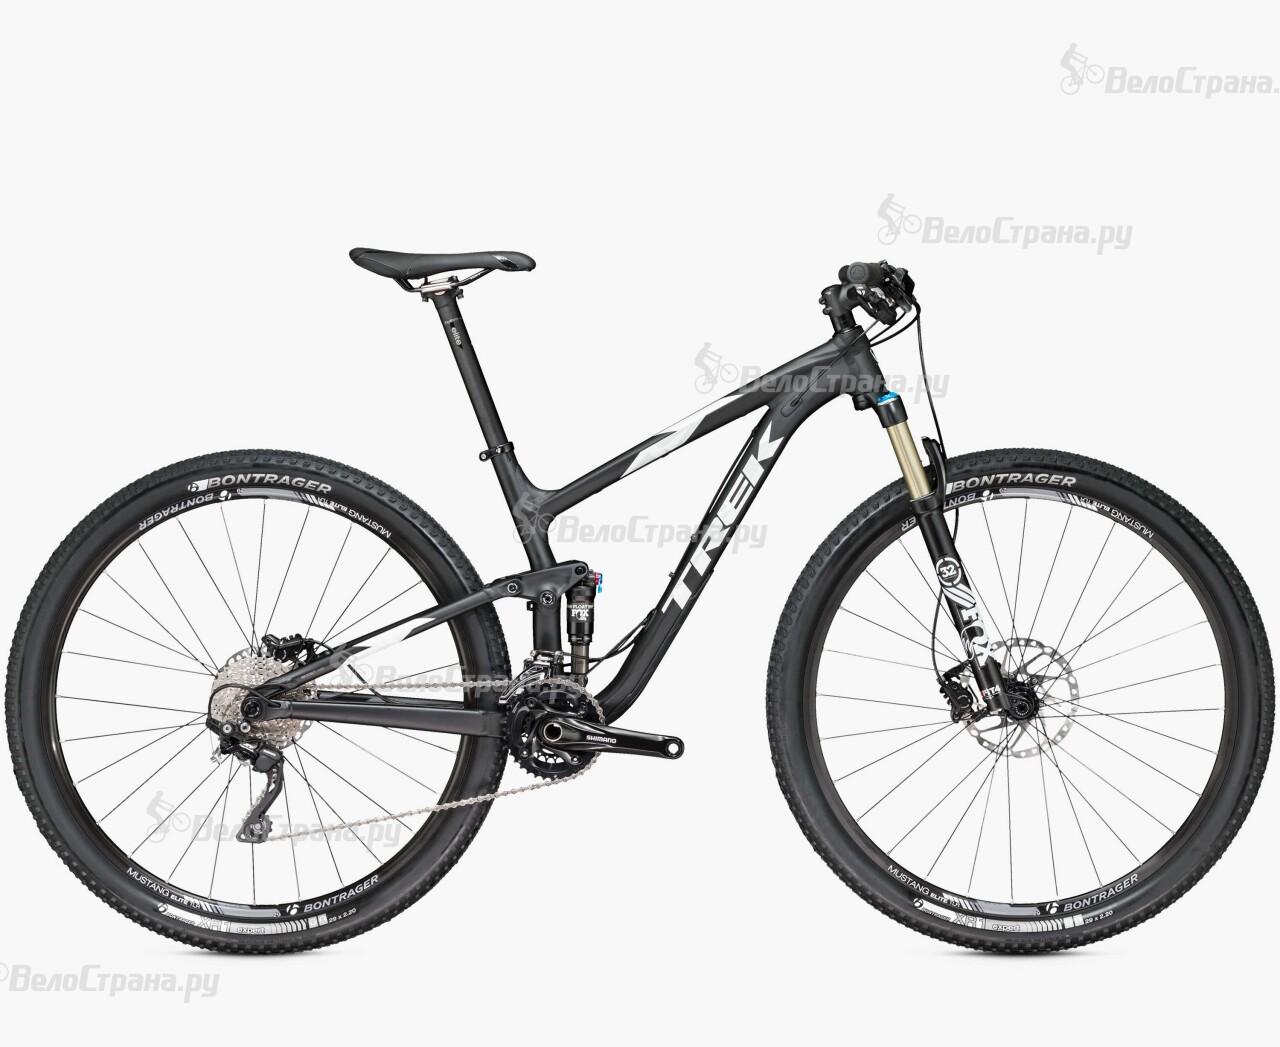 Велосипед Trek Top Fuel 8 27,5 (2016) велосипед trek fuel ex 9 29 2017